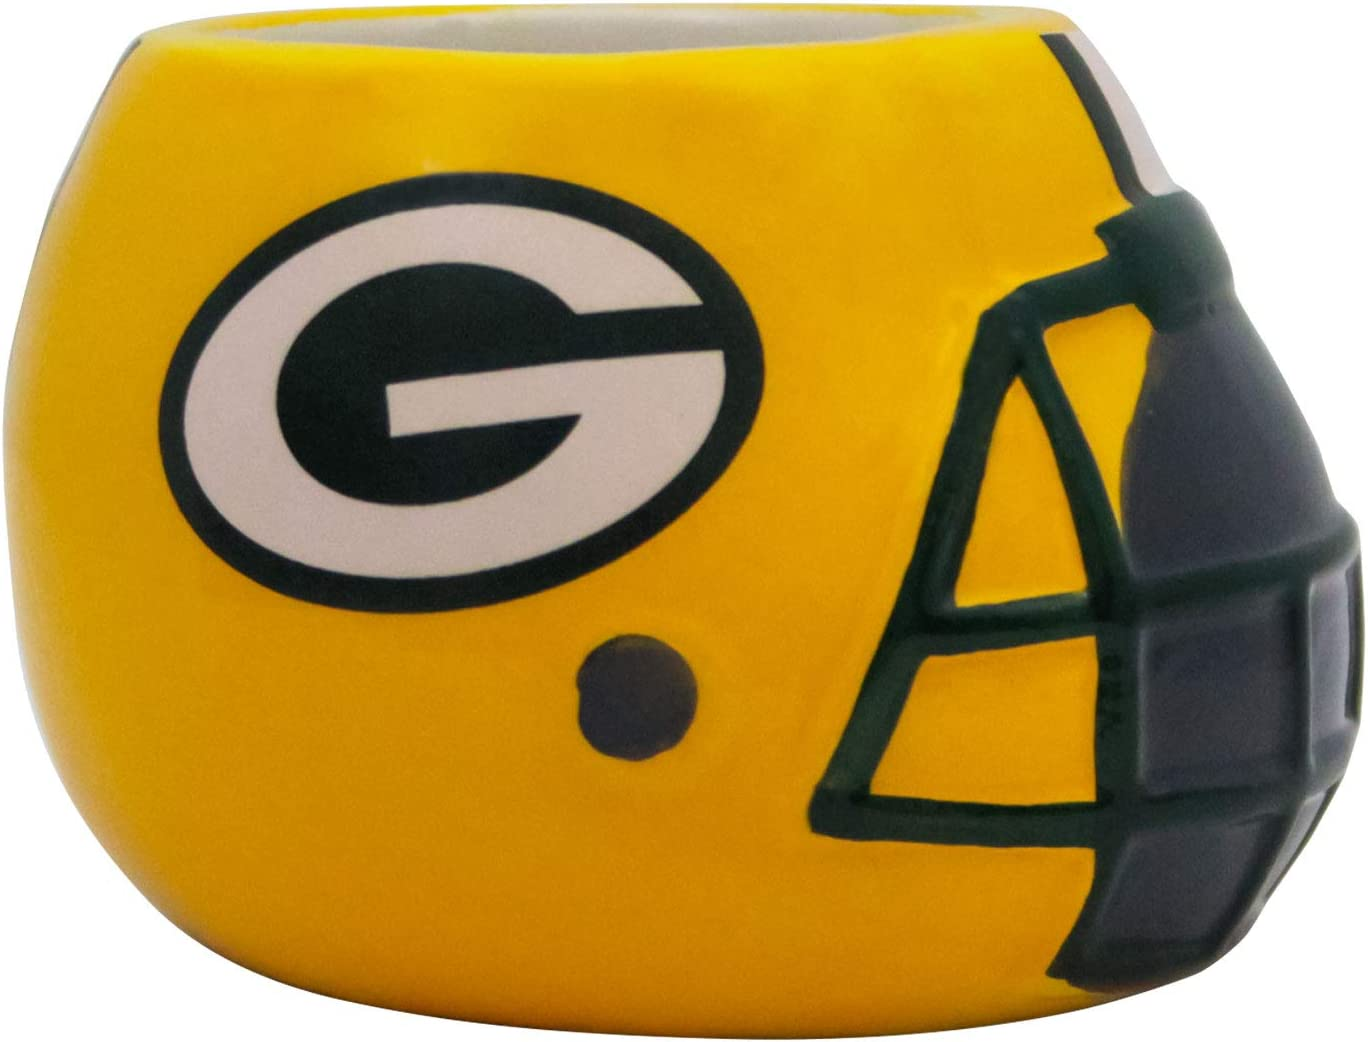 Green Bay Packers - Ceramic Helmet Planter - Empty